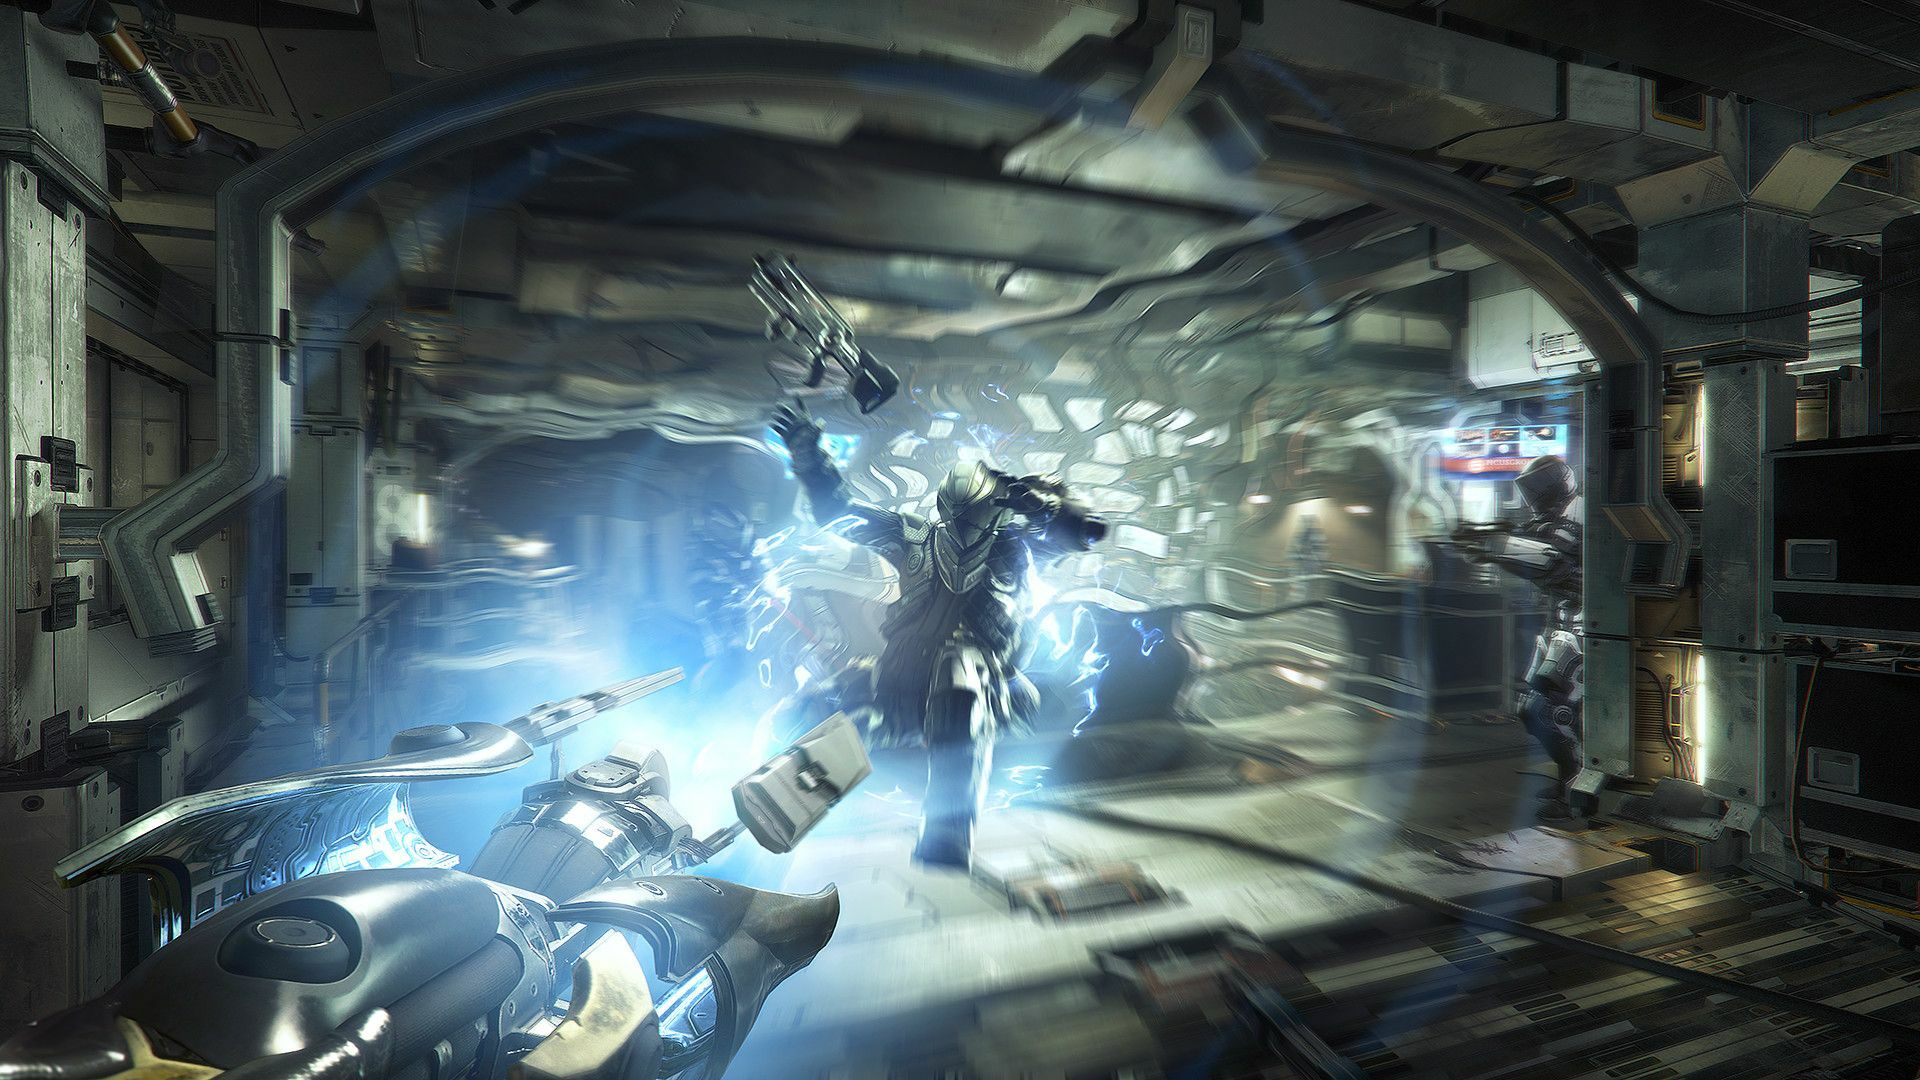 Deus Ex: Mankind Divided - Digital Deluxe Edition screenshot 3